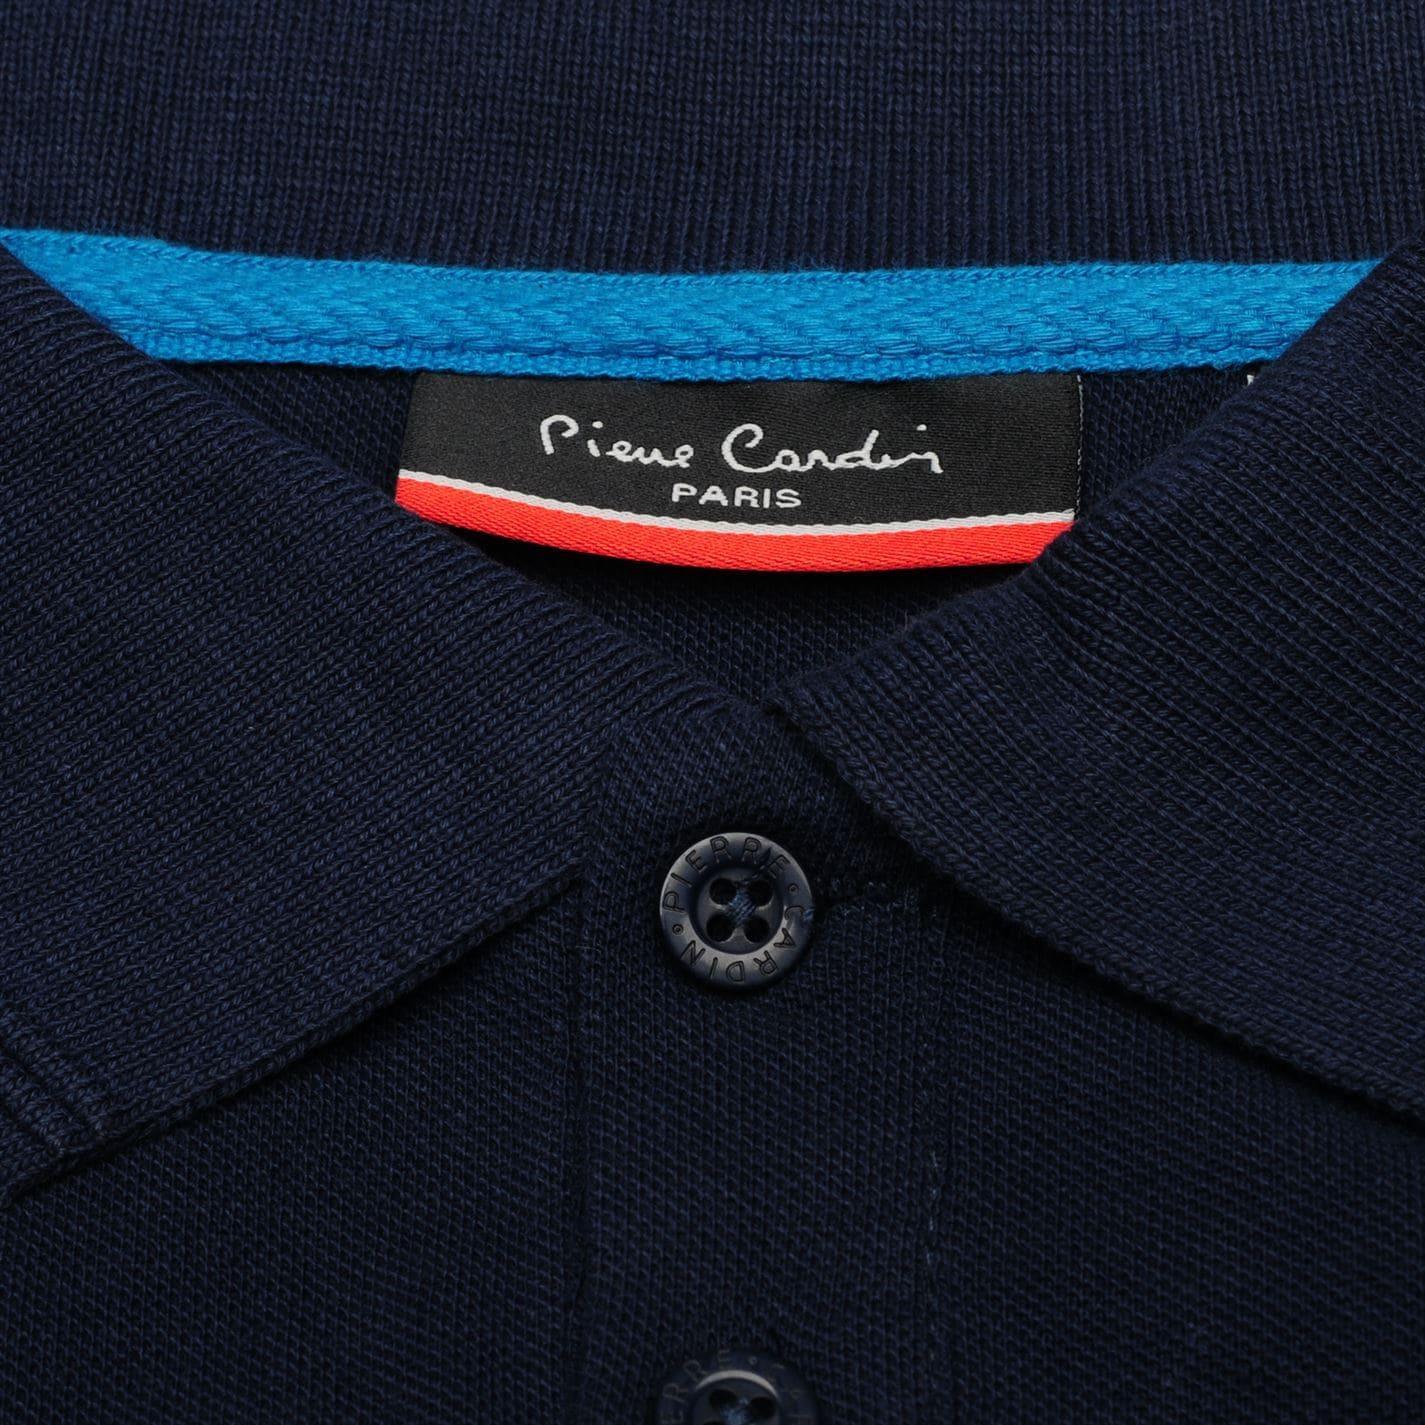 NEW-Pierre-Cardin-Mens-Long-Sleeve-Pure-Cotton-Polo-Shirt-Size-S-M-L-XL-XXL thumbnail 22